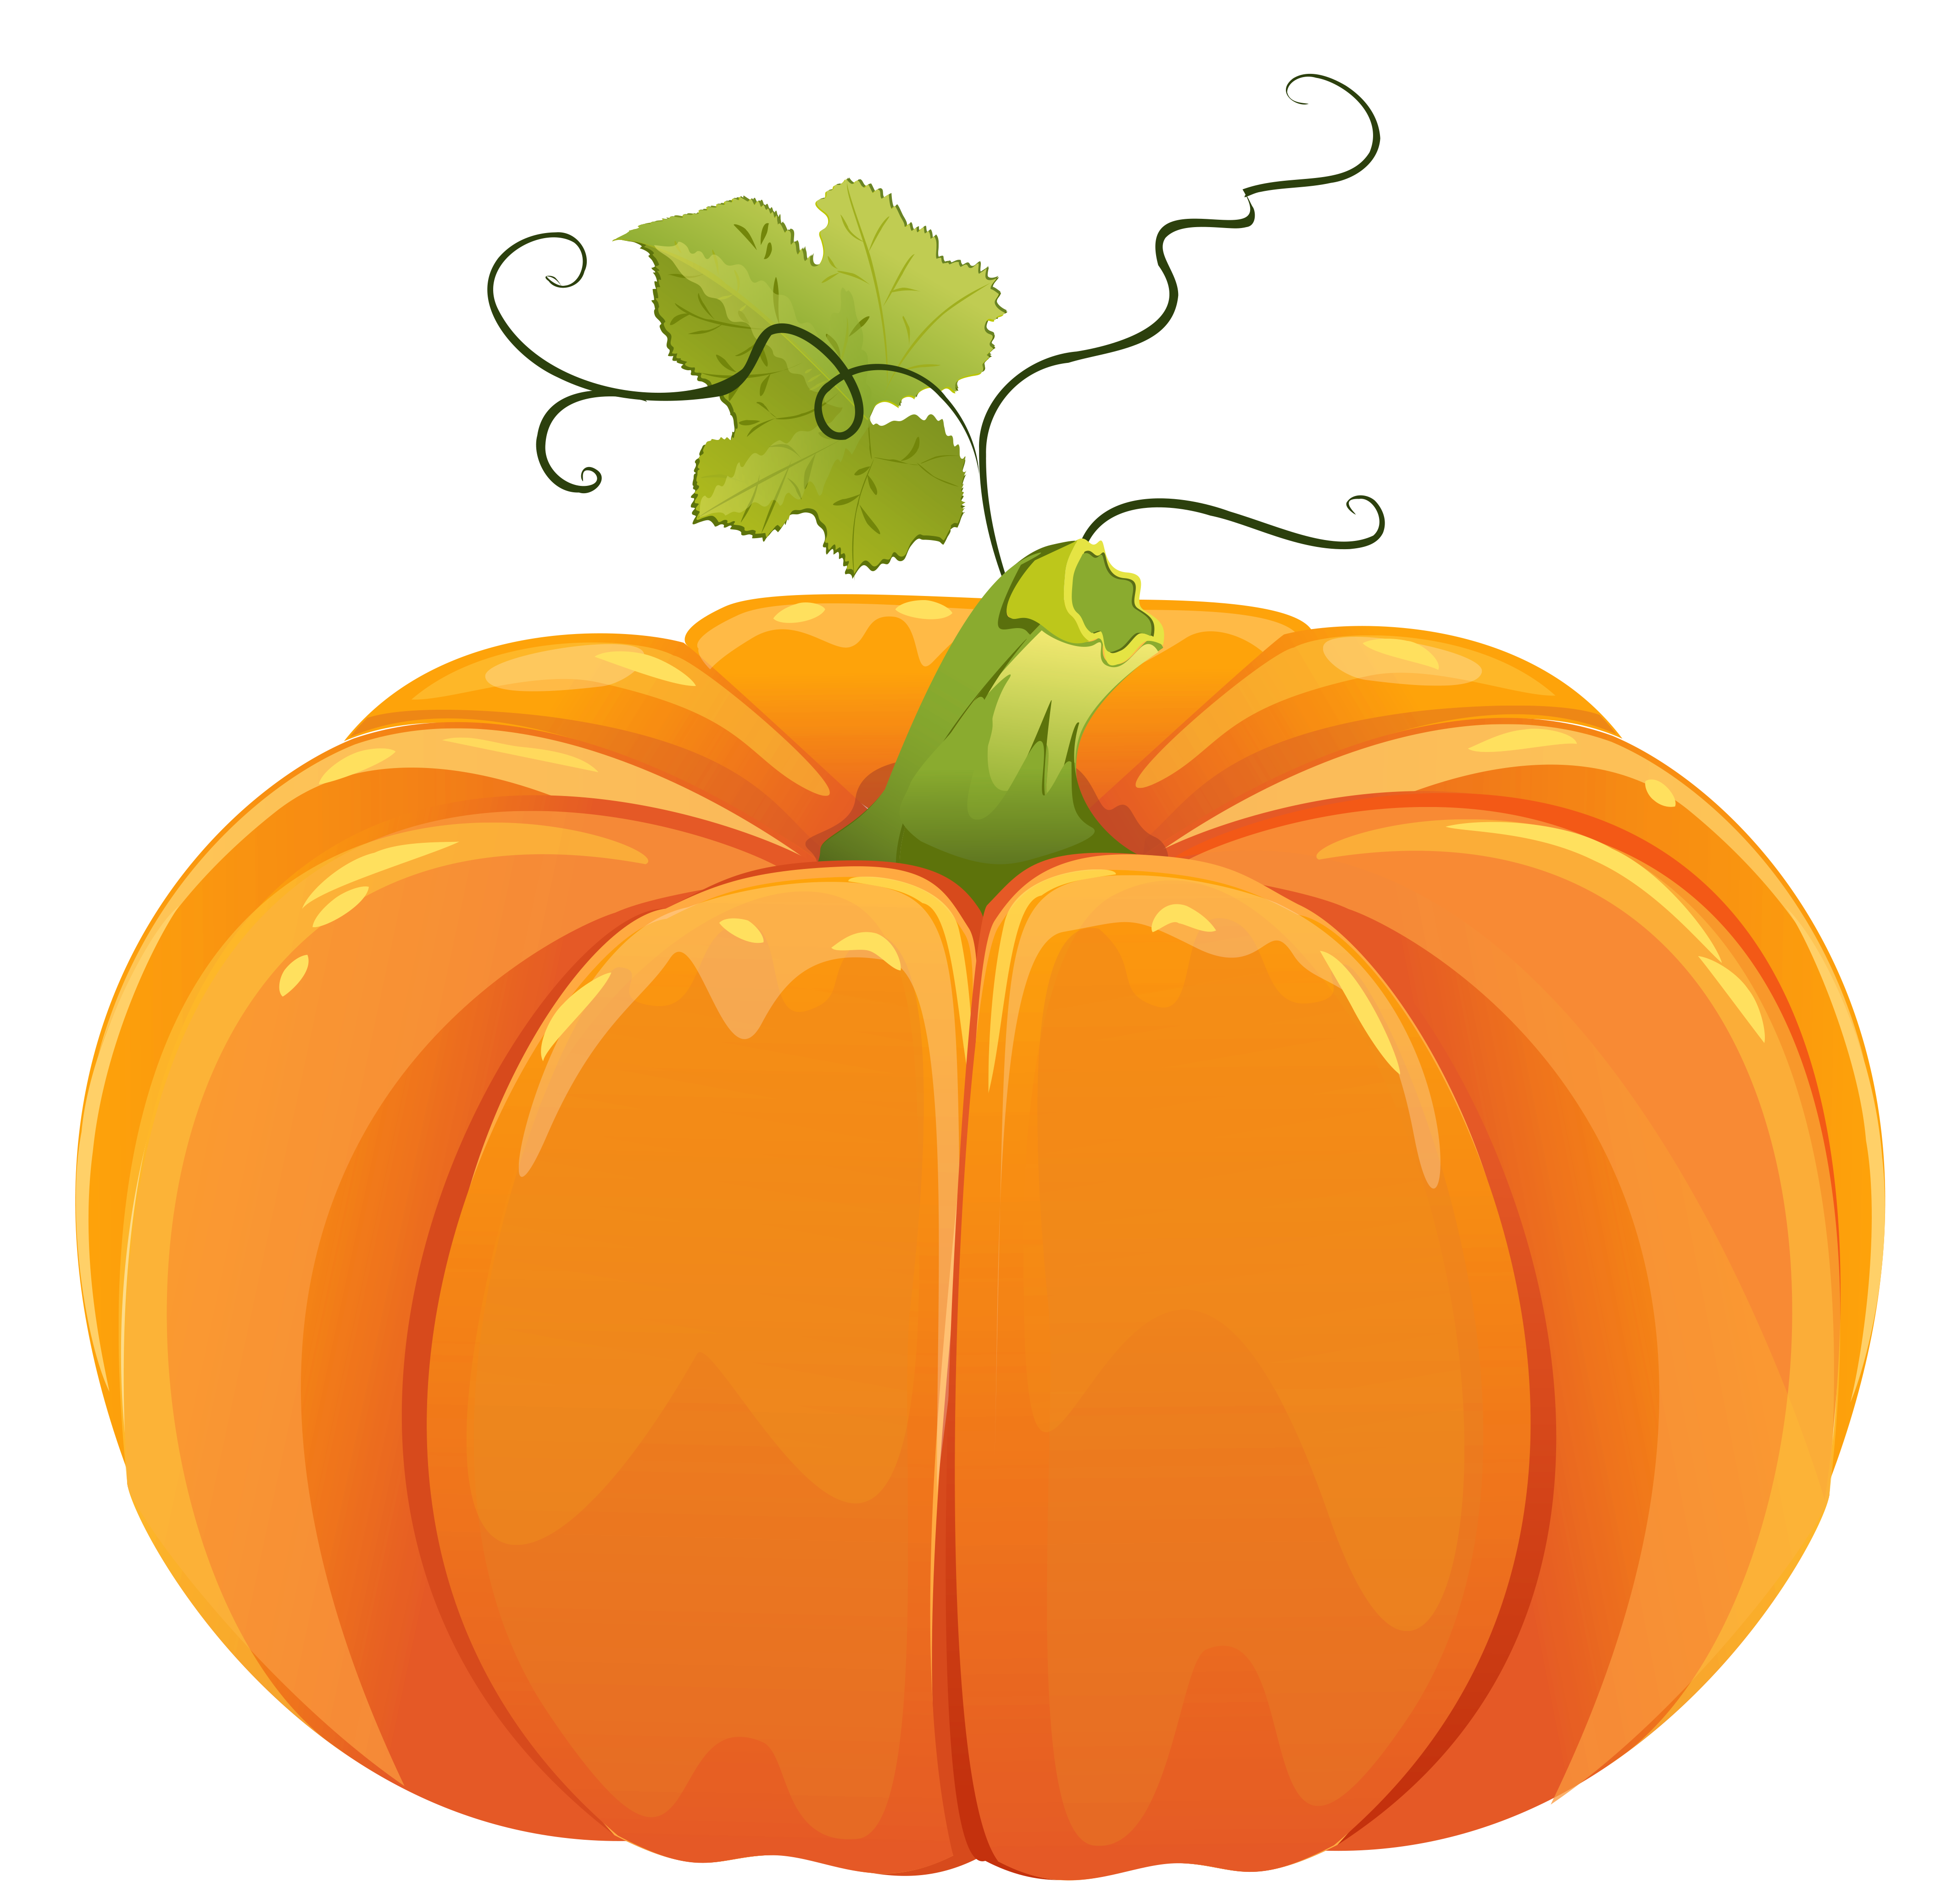 Clip Art Of A Pumpkin-Clip art of a pumpkin-2